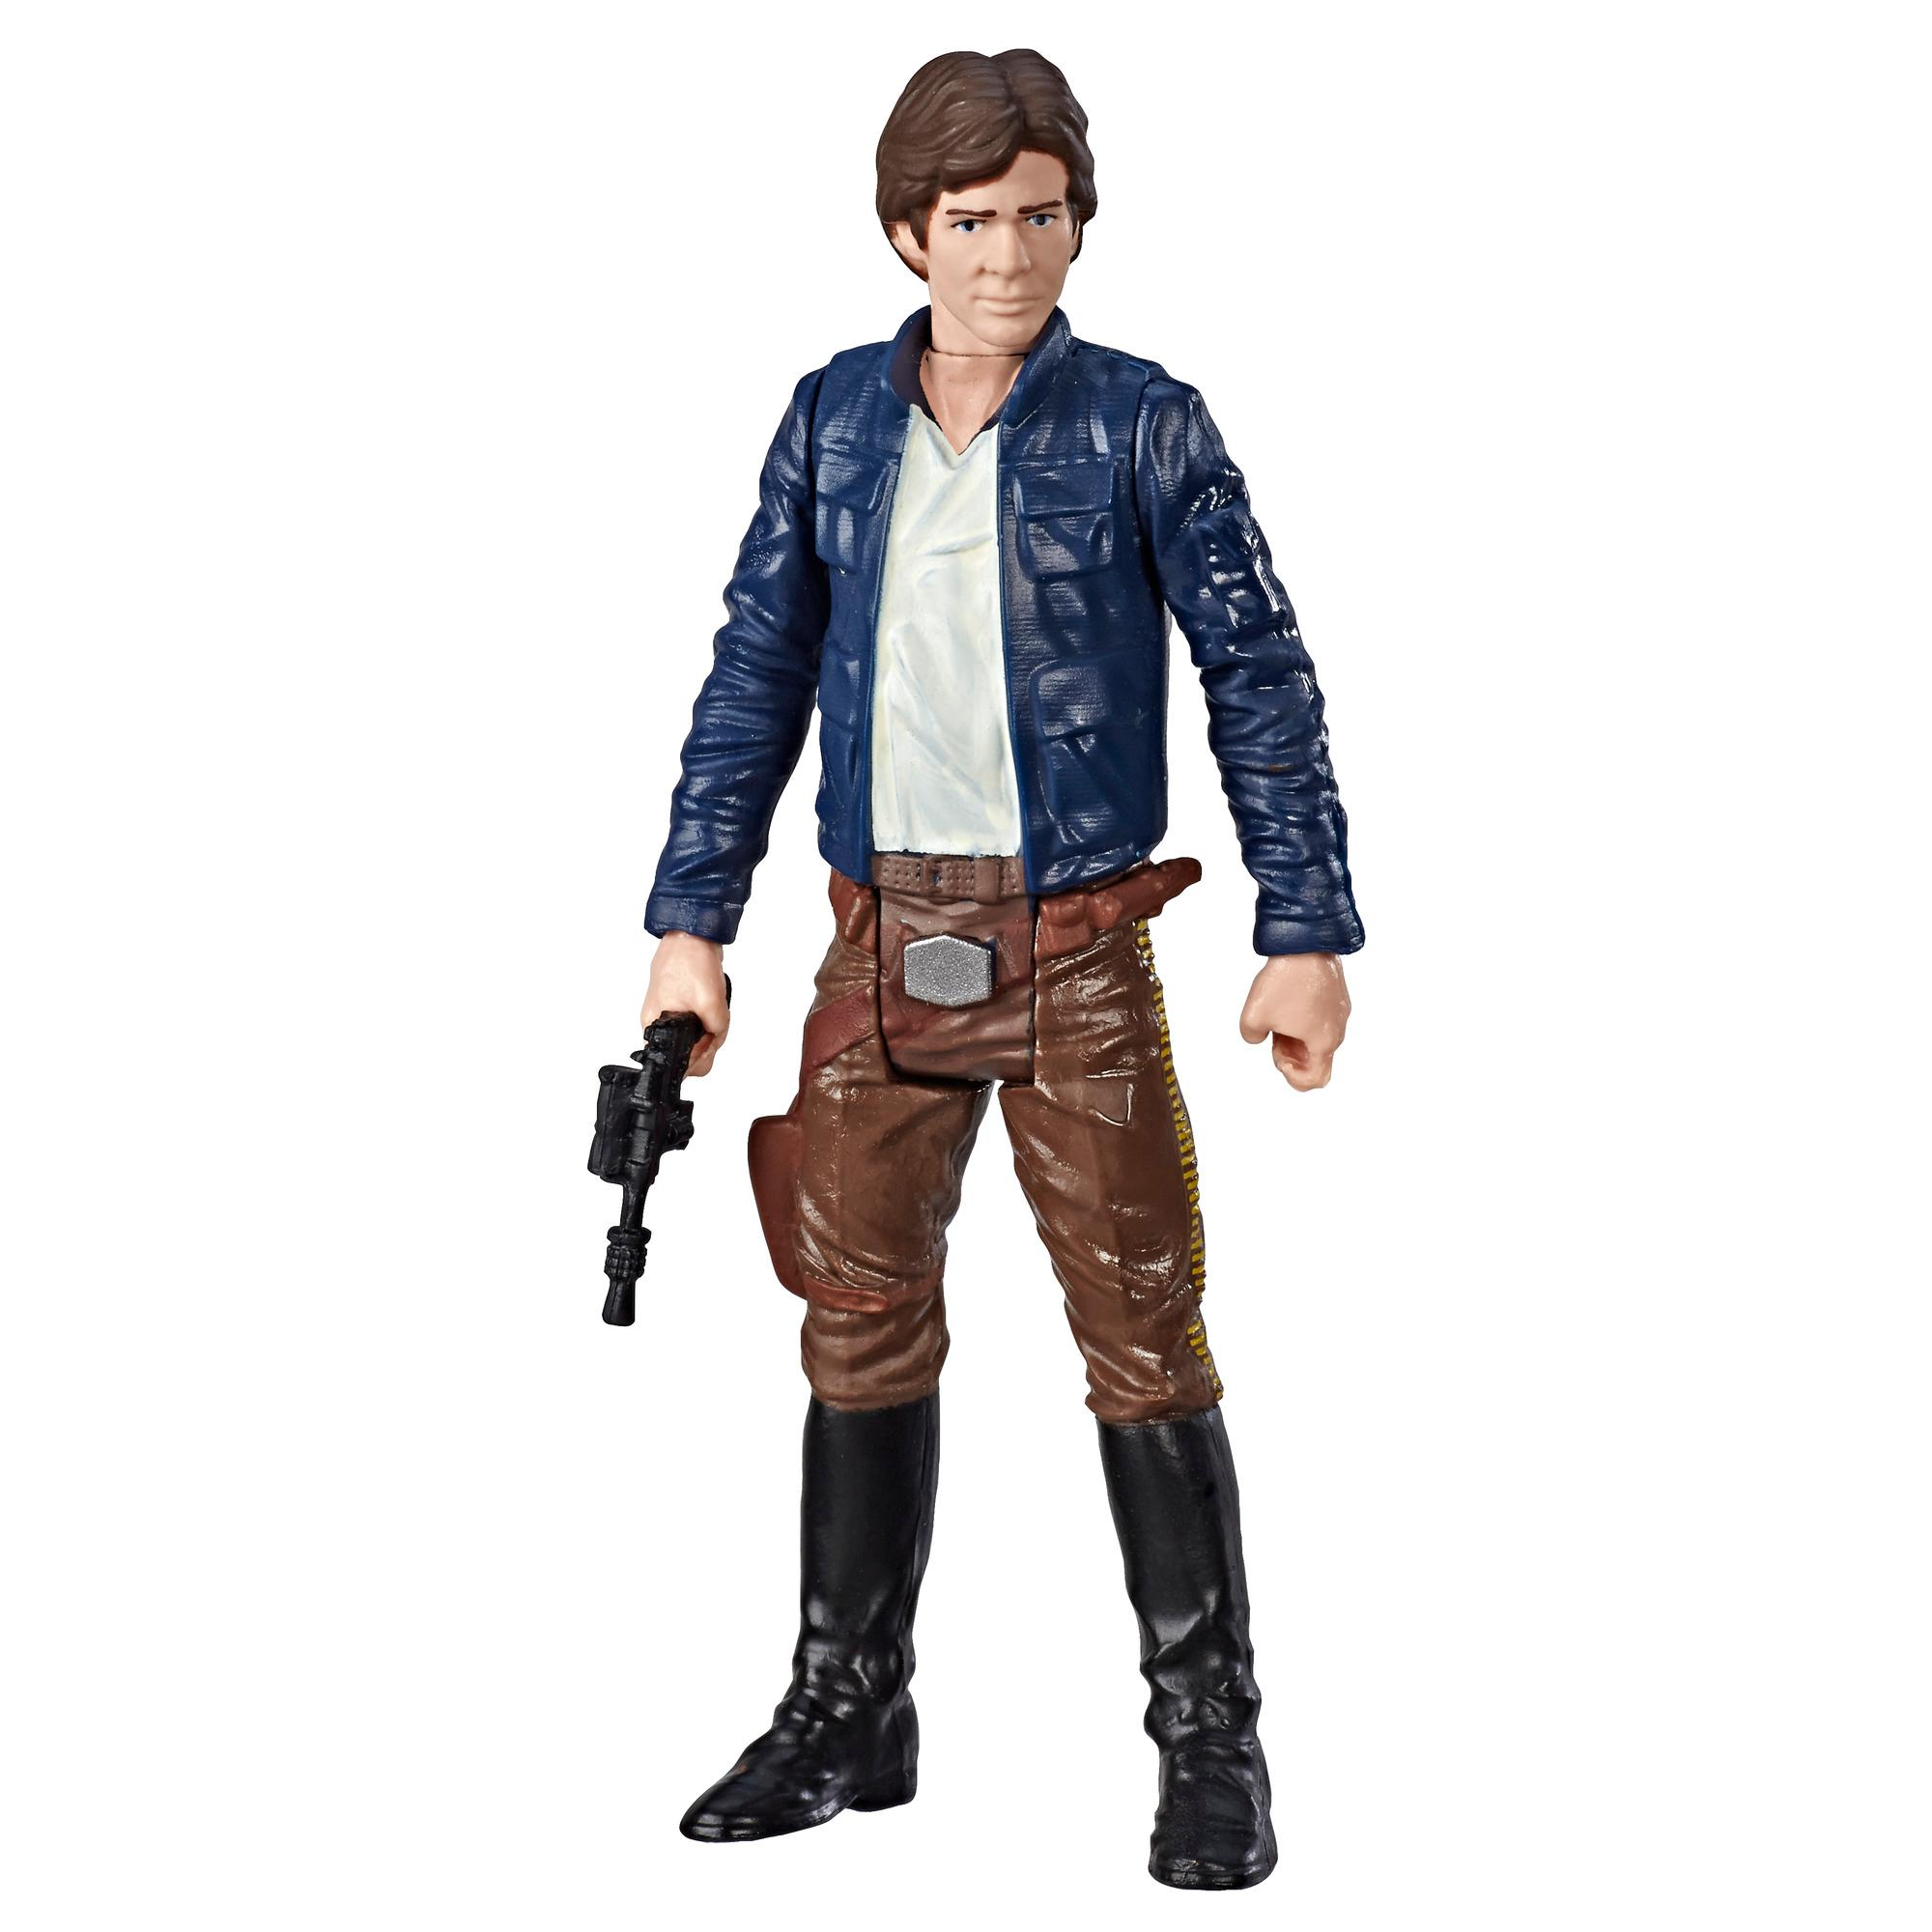 Star Wars Galaxy of Adventures Han Solo Figure and Mini Comic